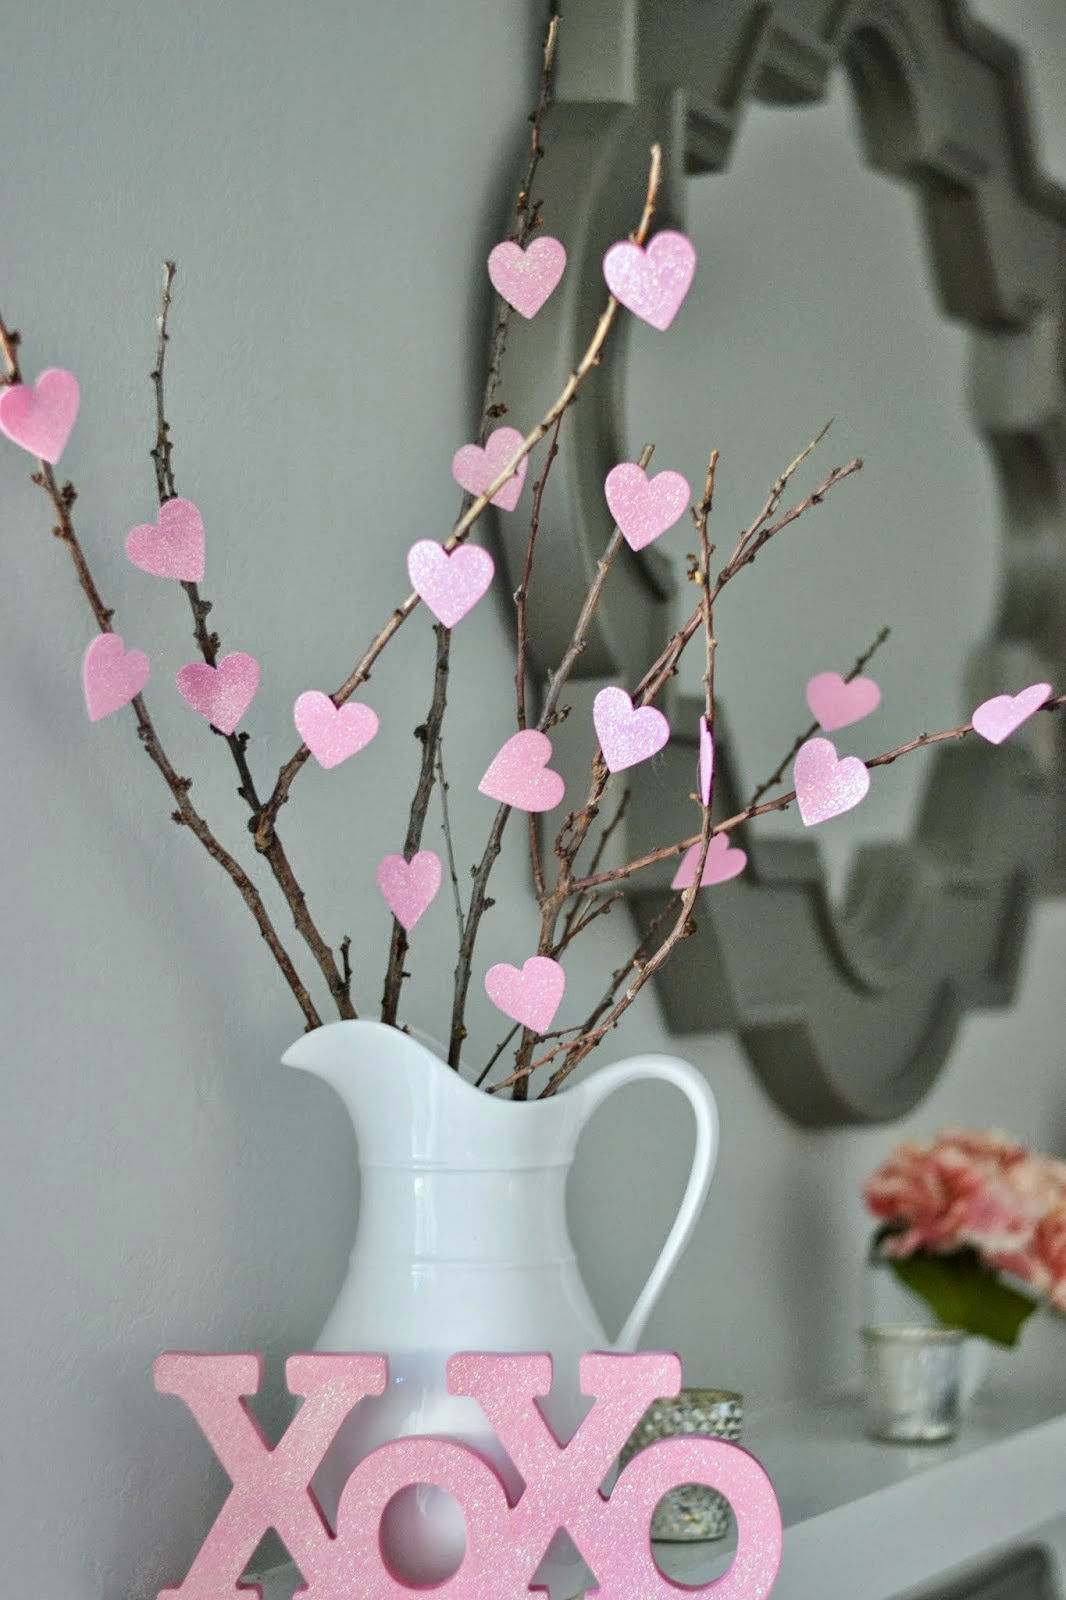 DIY Cute and Cheap Heart Tree